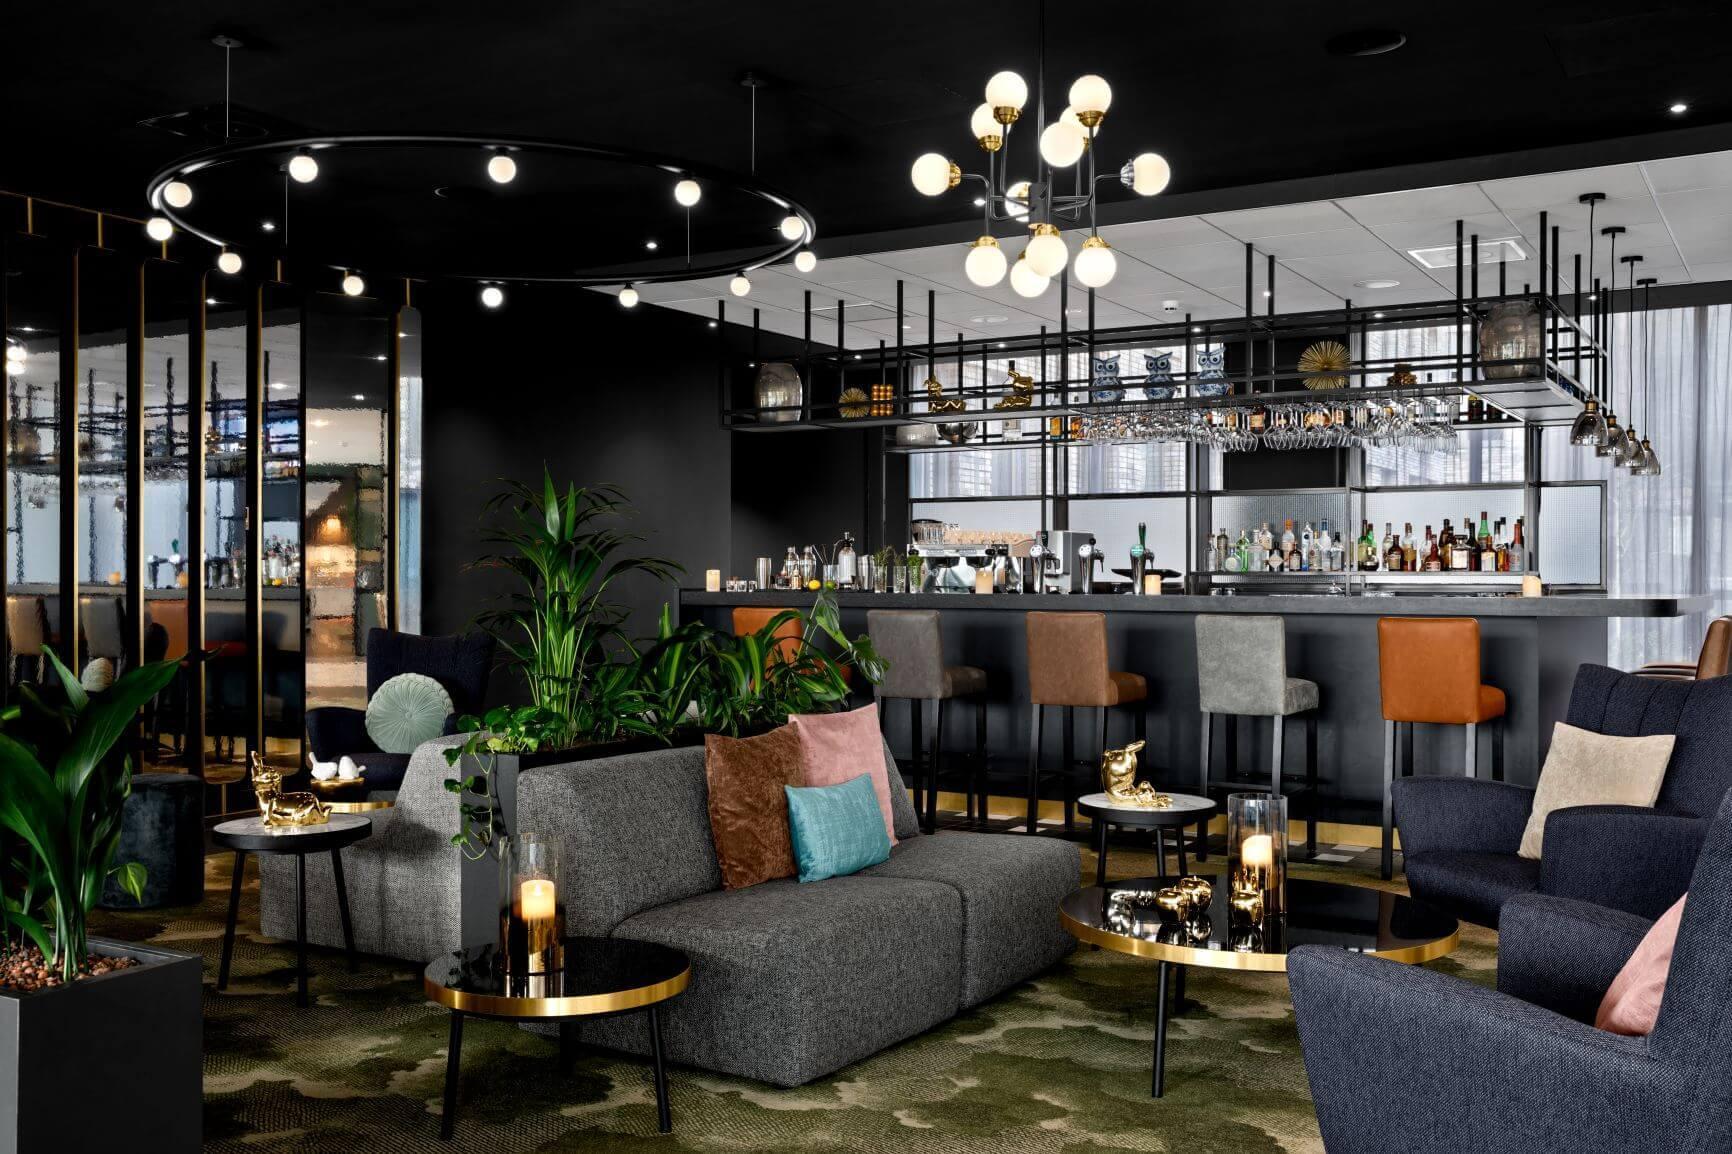 Signature Restaurant and Bloom Bar of Renaissance Hotel Aalsmeer